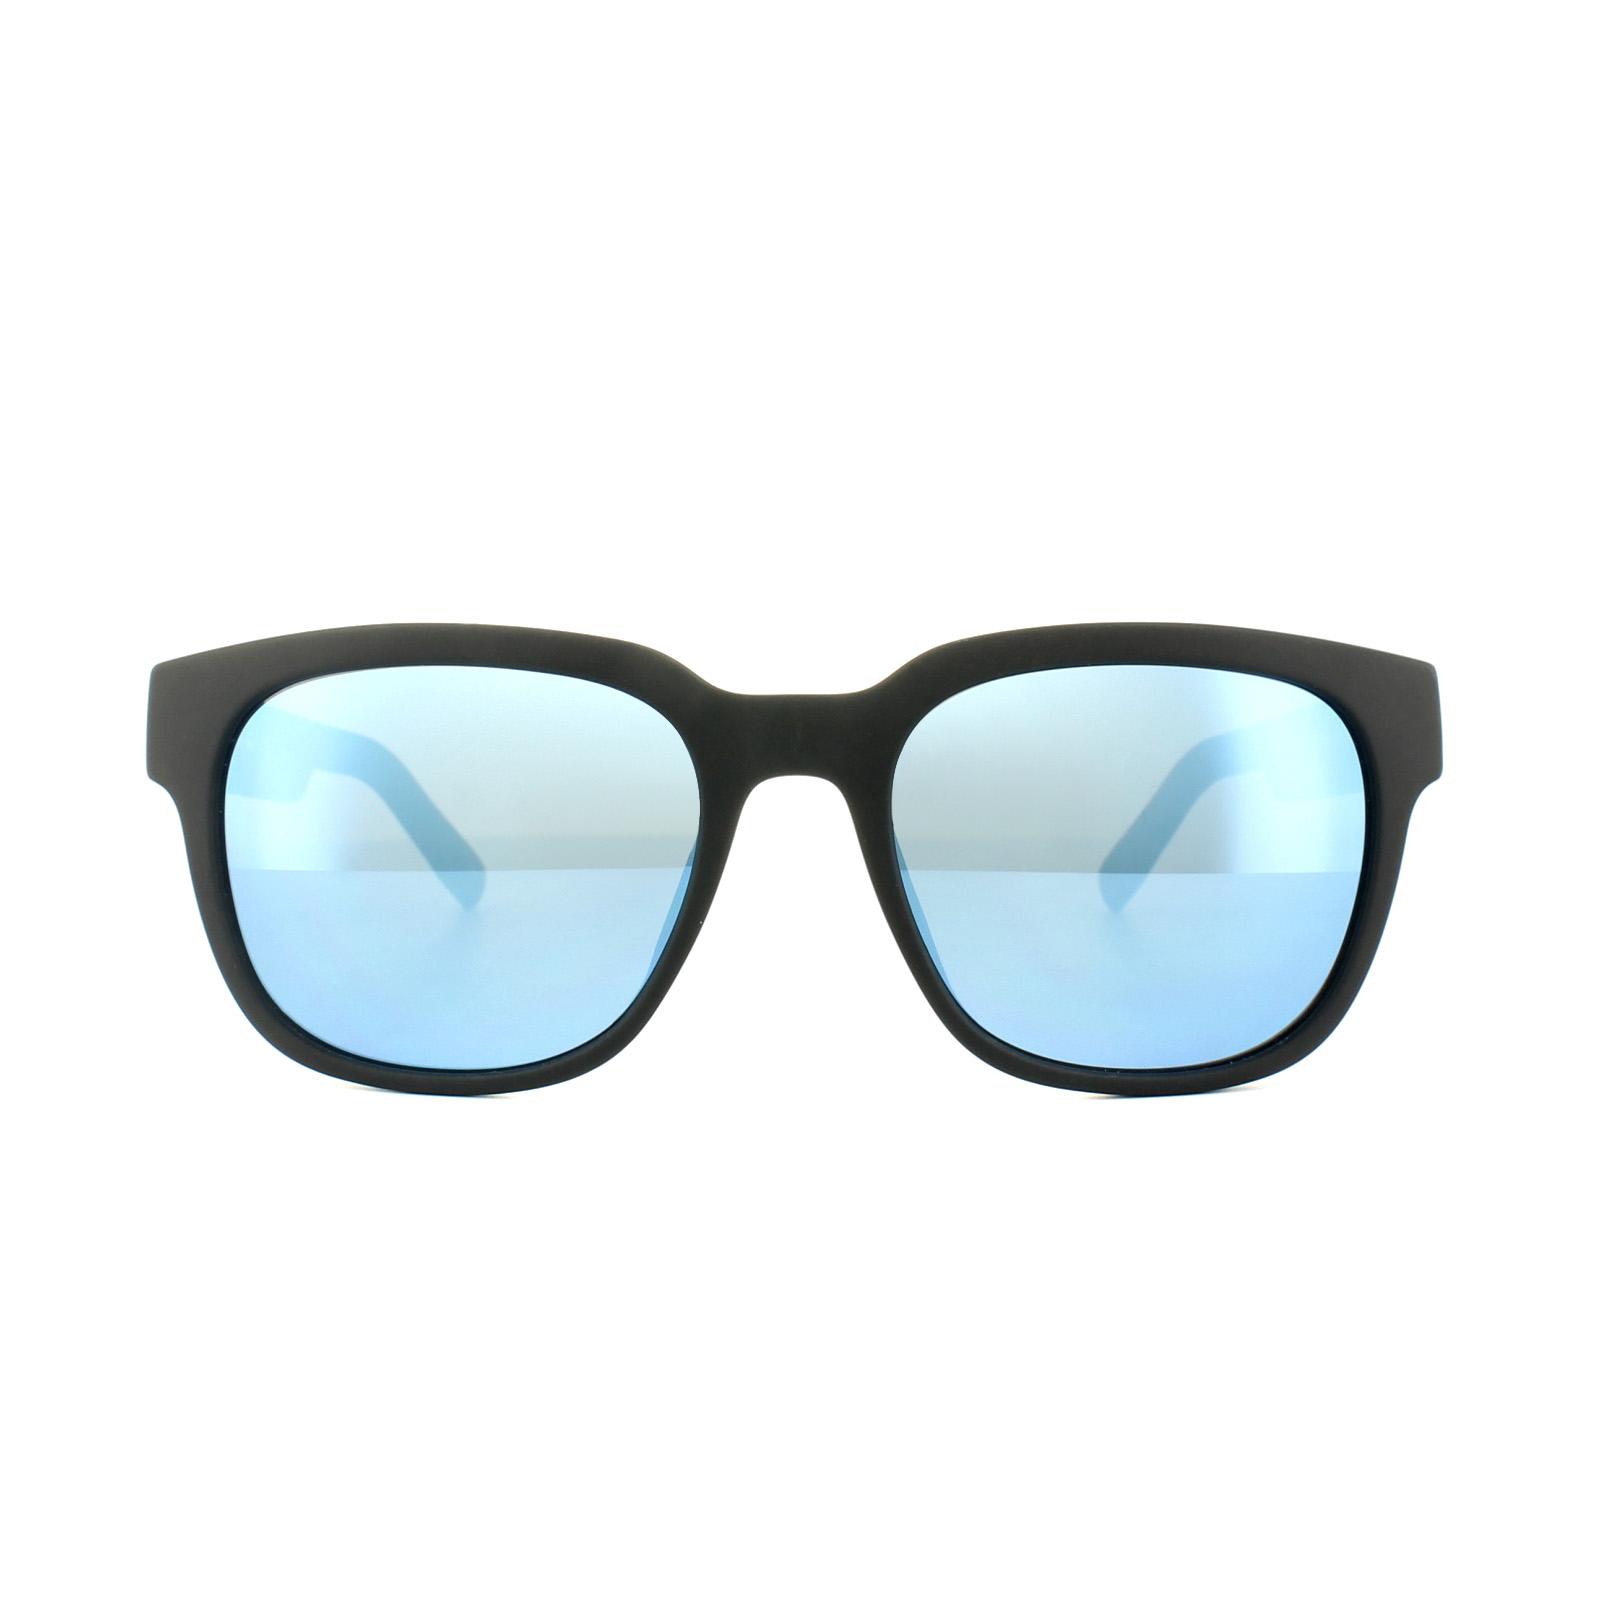 Lacoste Sunglasses L830S 001 Matt Black Blue Mirror 886895279635  99d7b72cb5a1